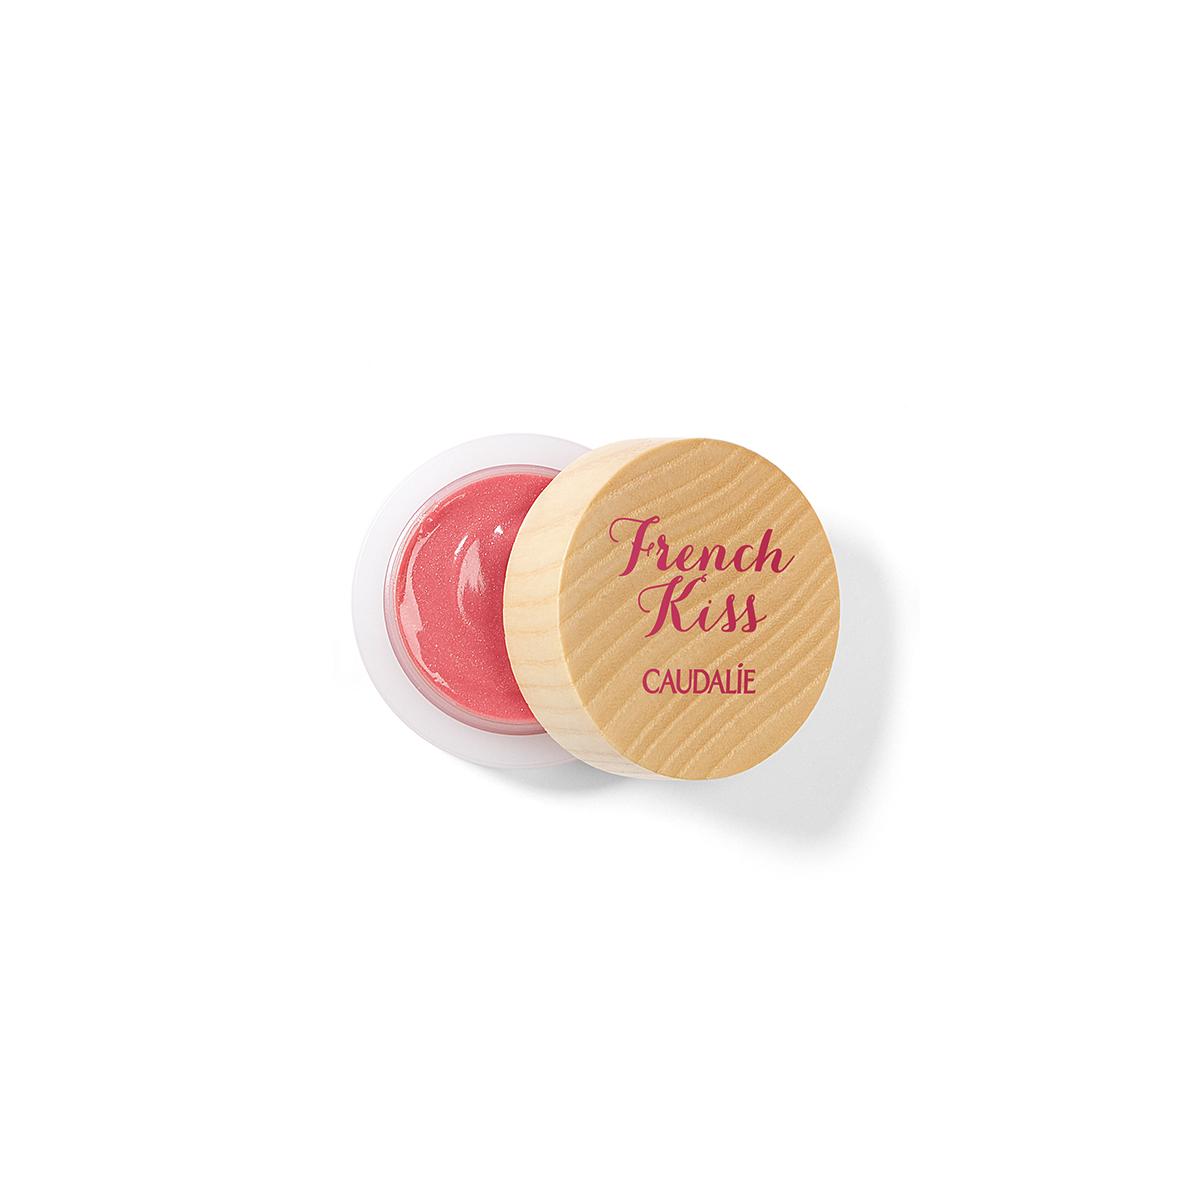 French Kiss Tinted Lip Balm Séduction